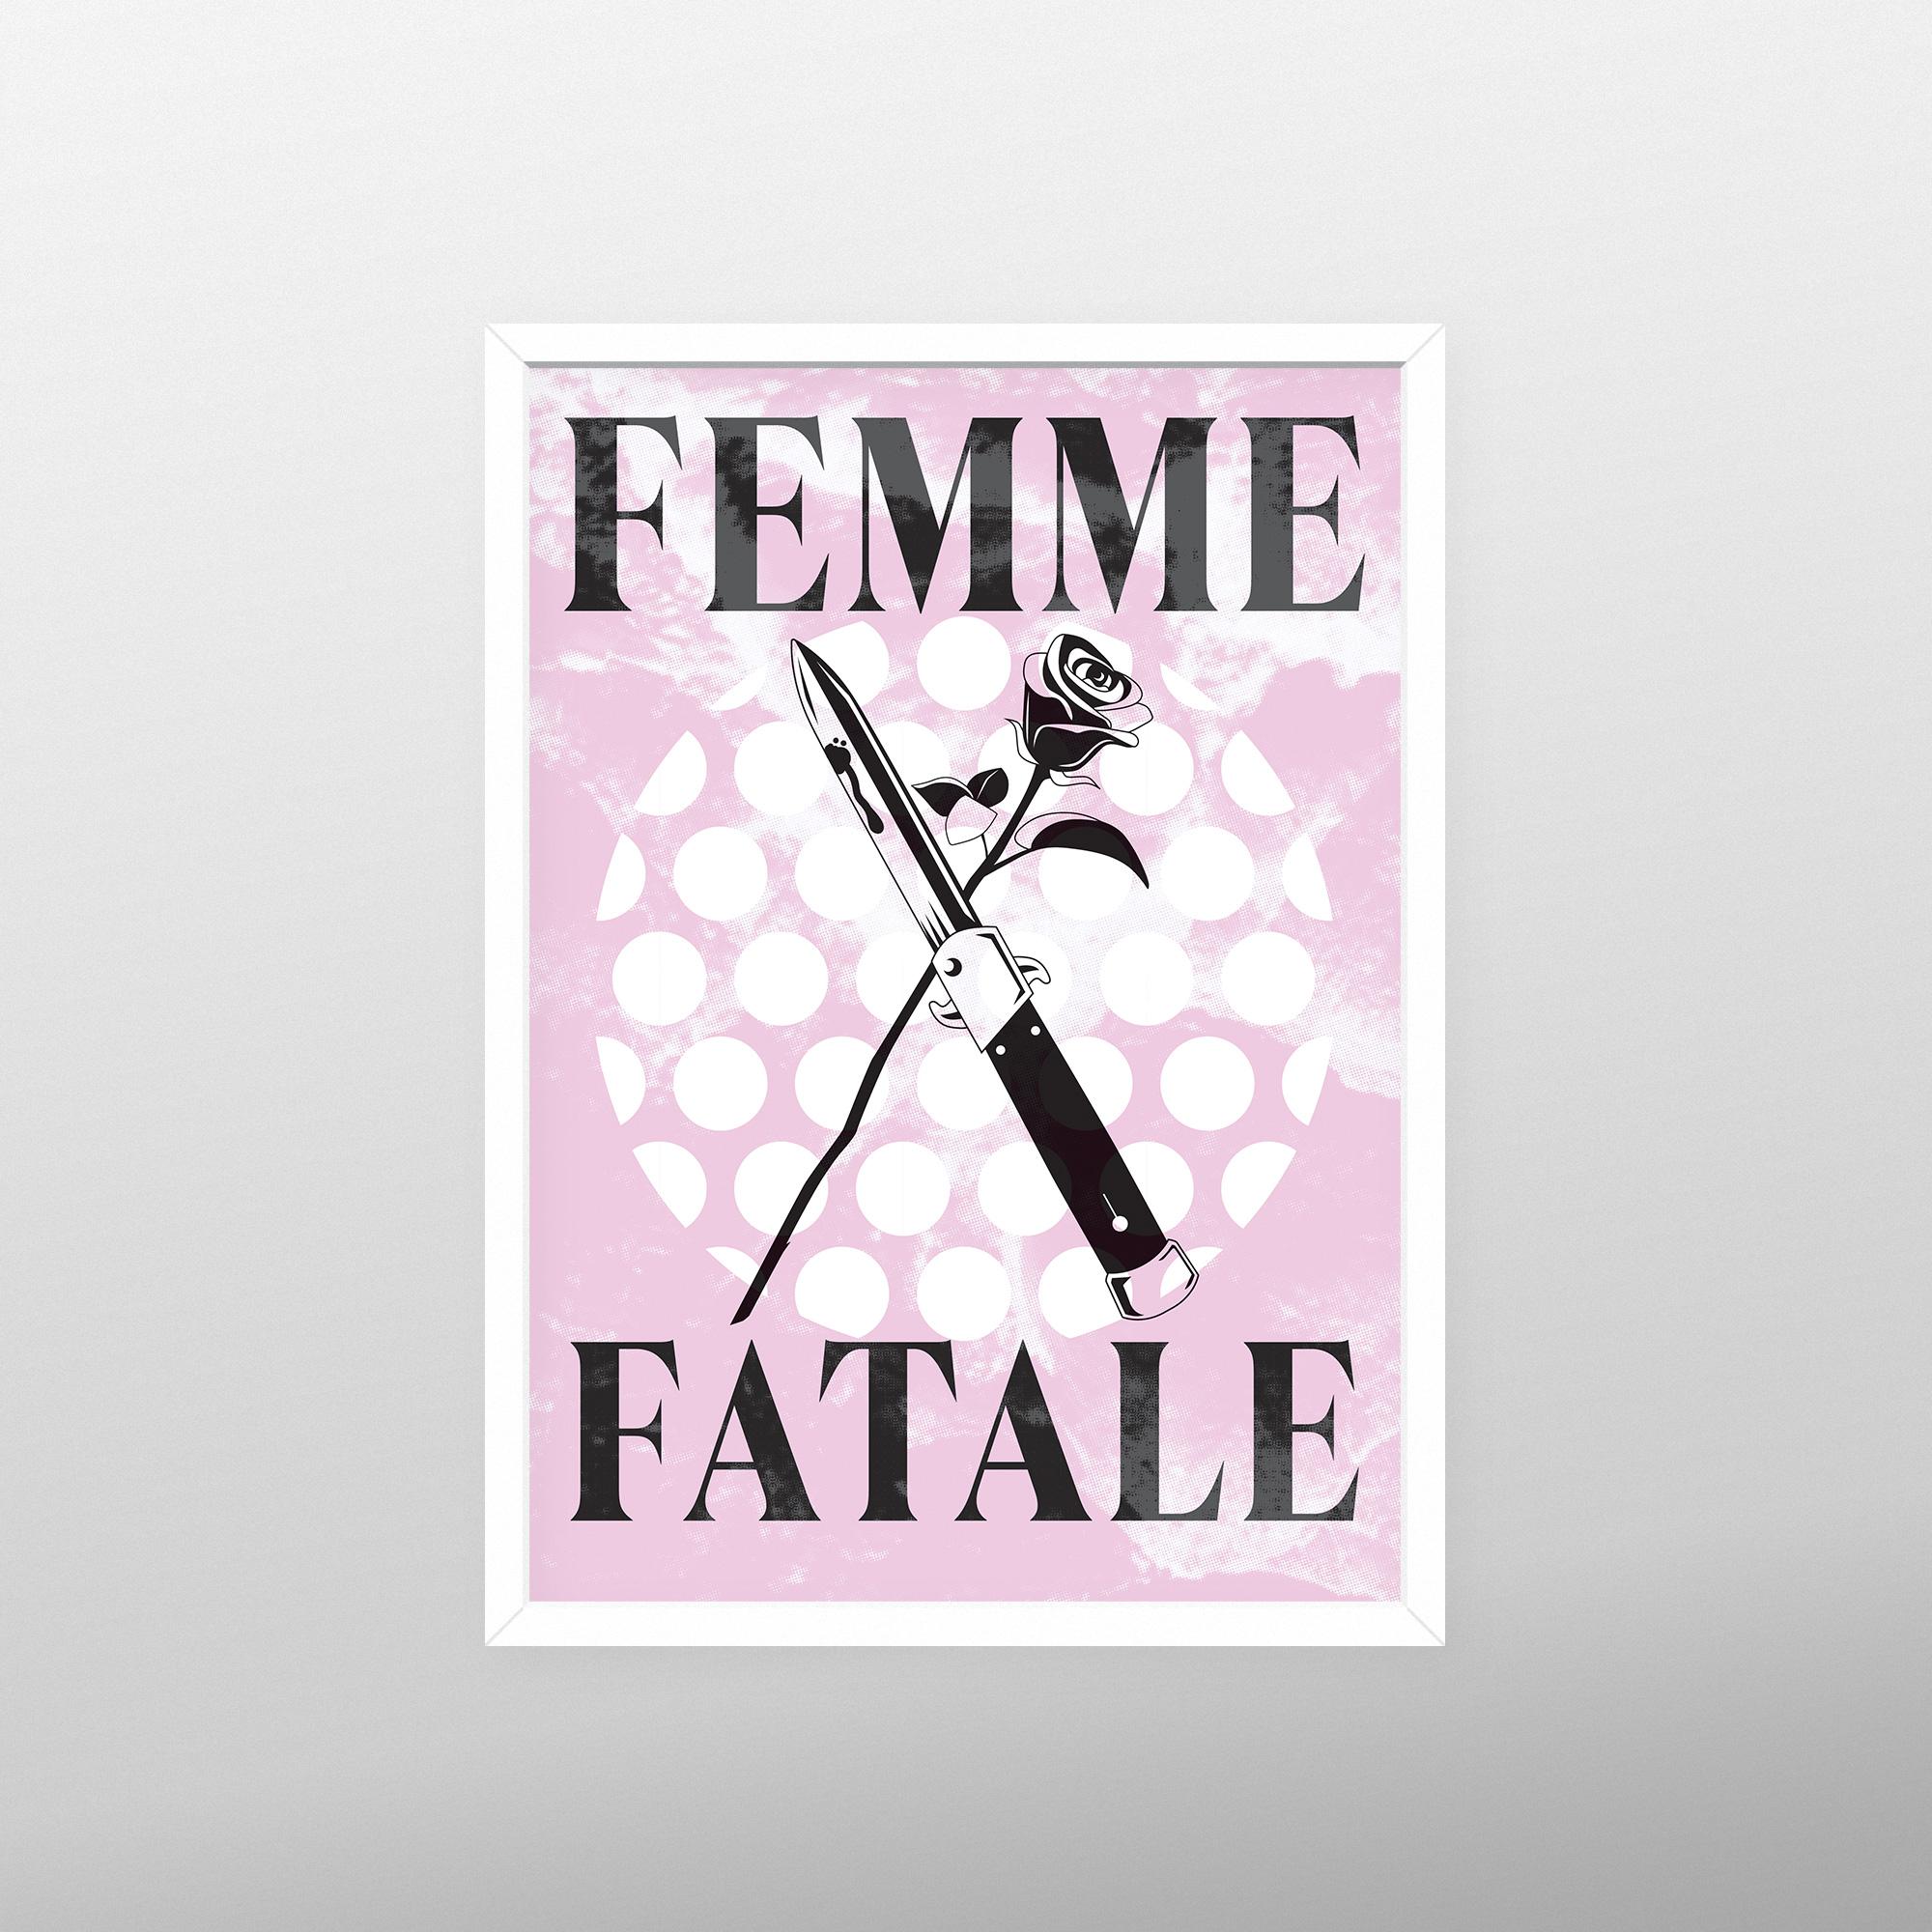 Femme Fatale print